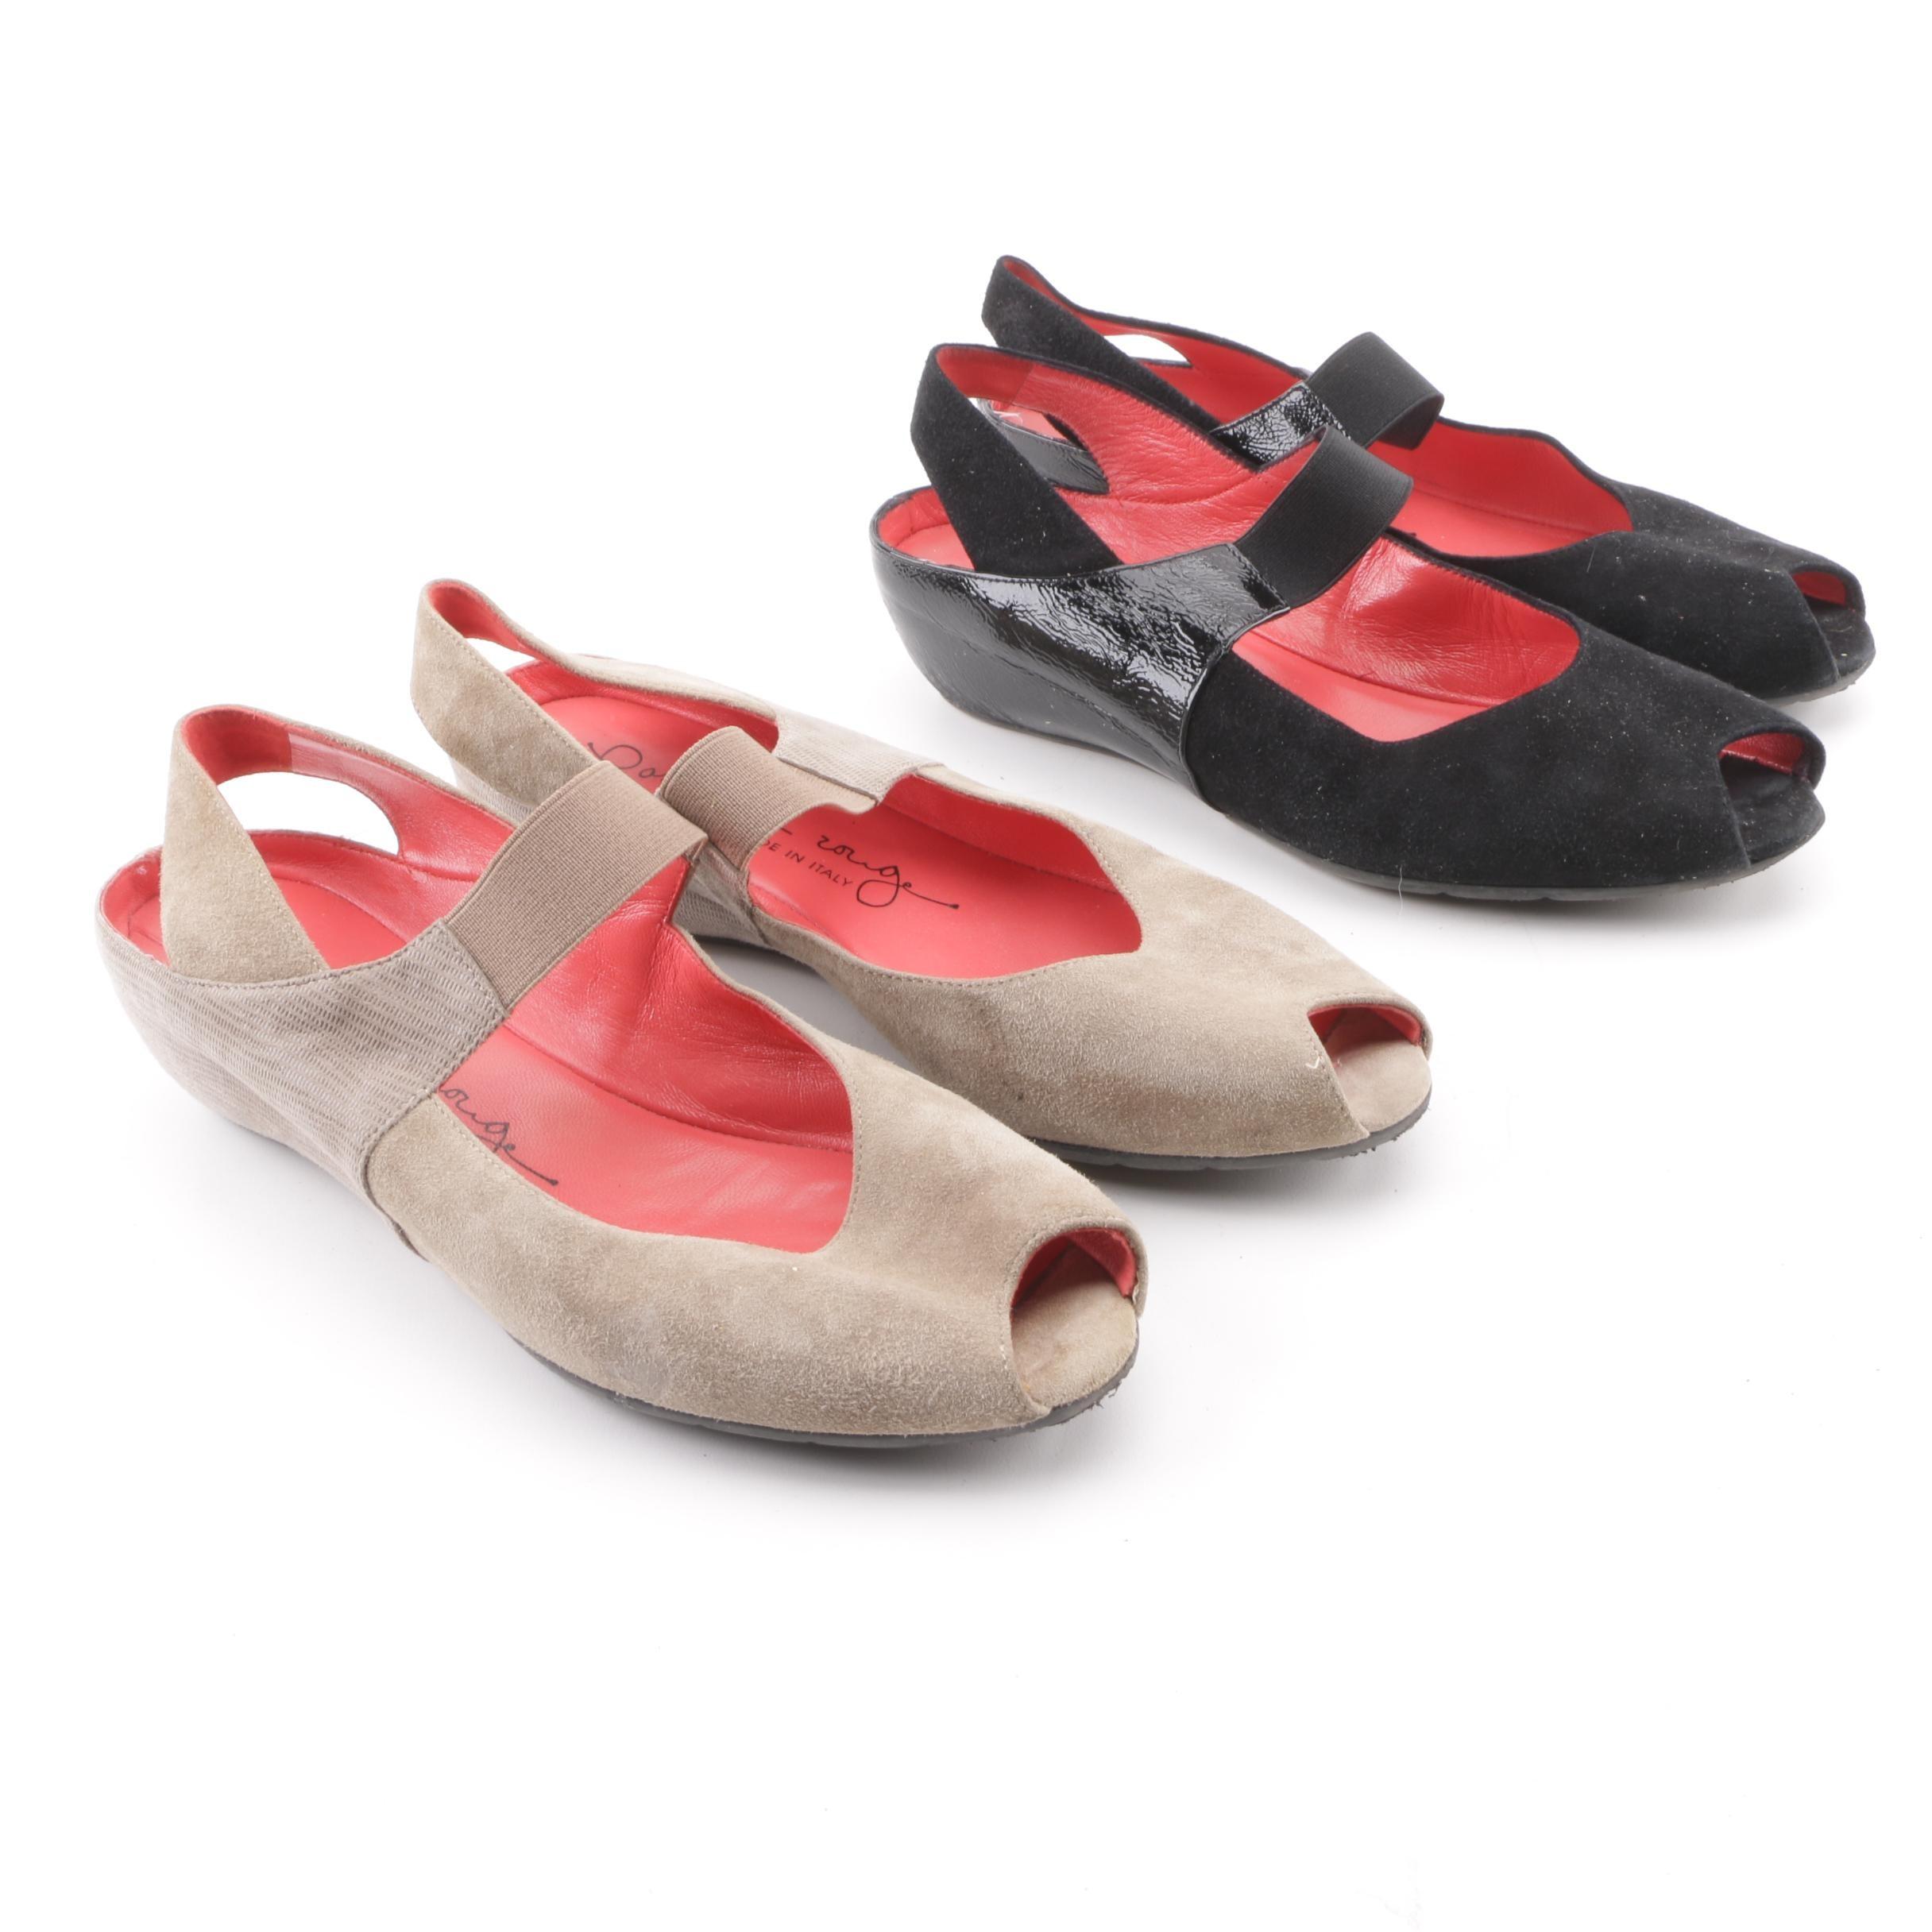 Pas de Rouge Black and Beige Suede Peep-Toe Slingback Wedge Flats